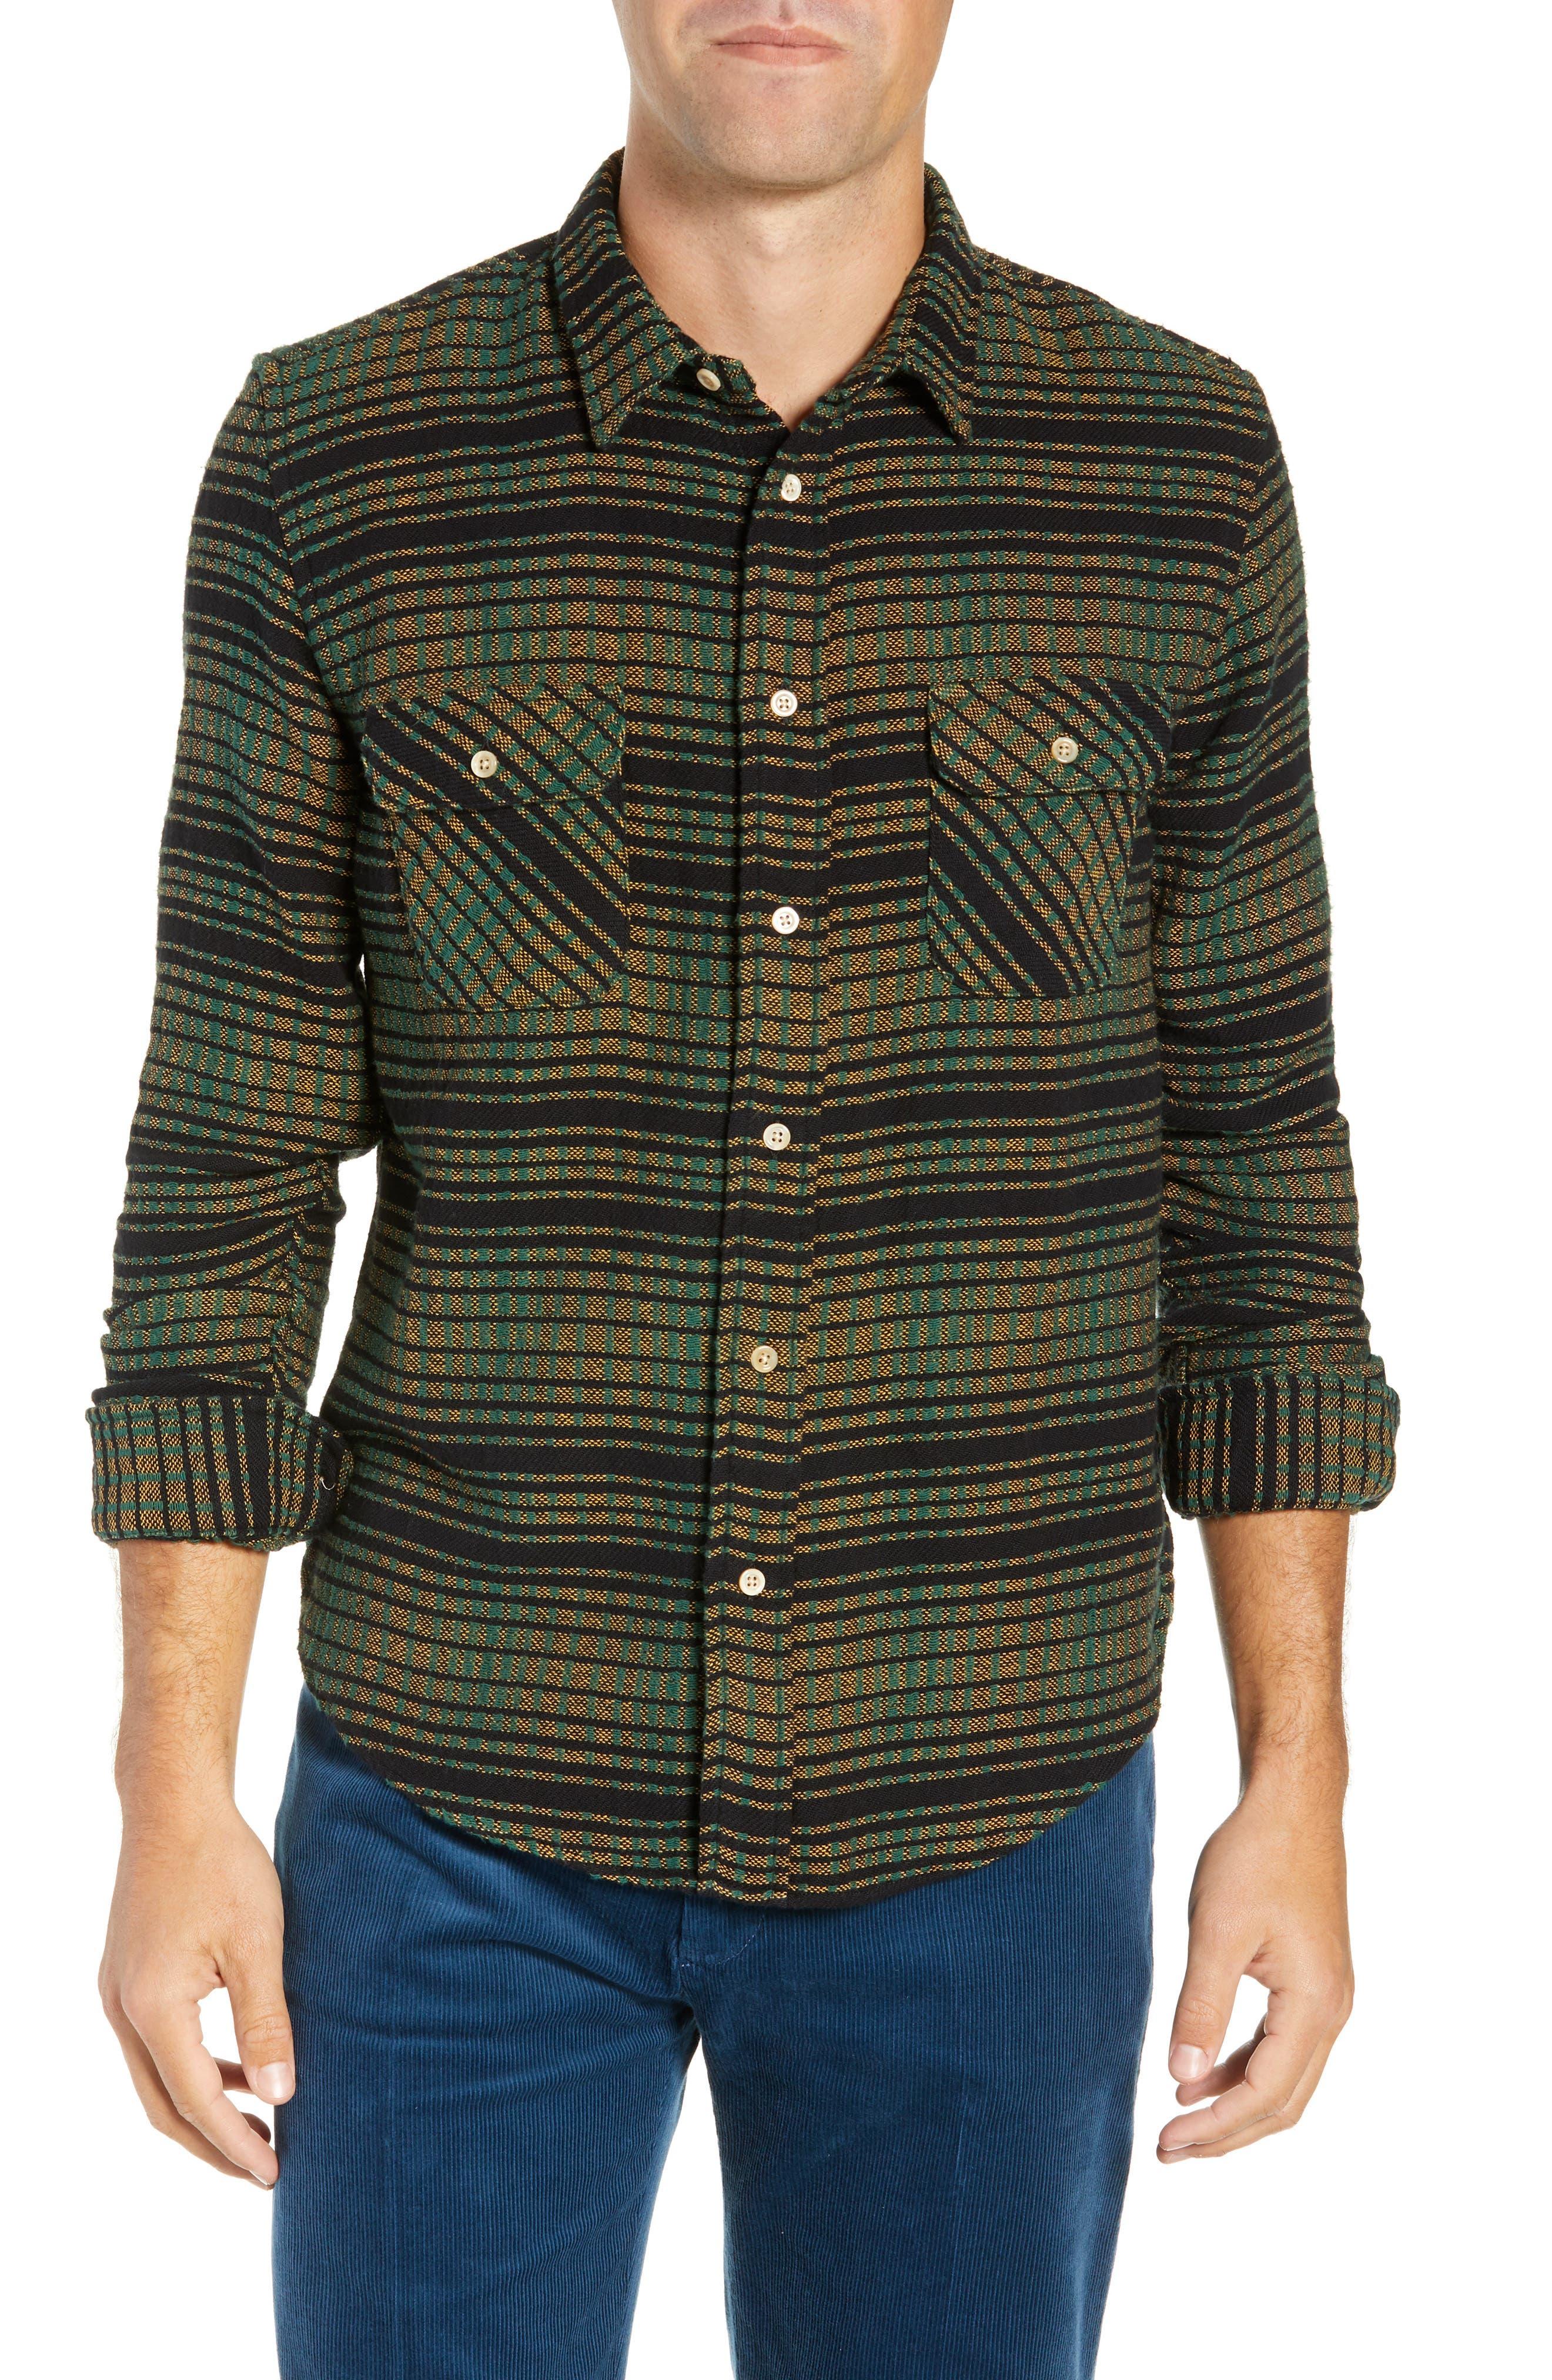 LEVI'S<SUP>®</SUP> VINTAGE CLOTHING,                             Shorthorn Slim Fit Sport Shirt,                             Main thumbnail 1, color,                             300